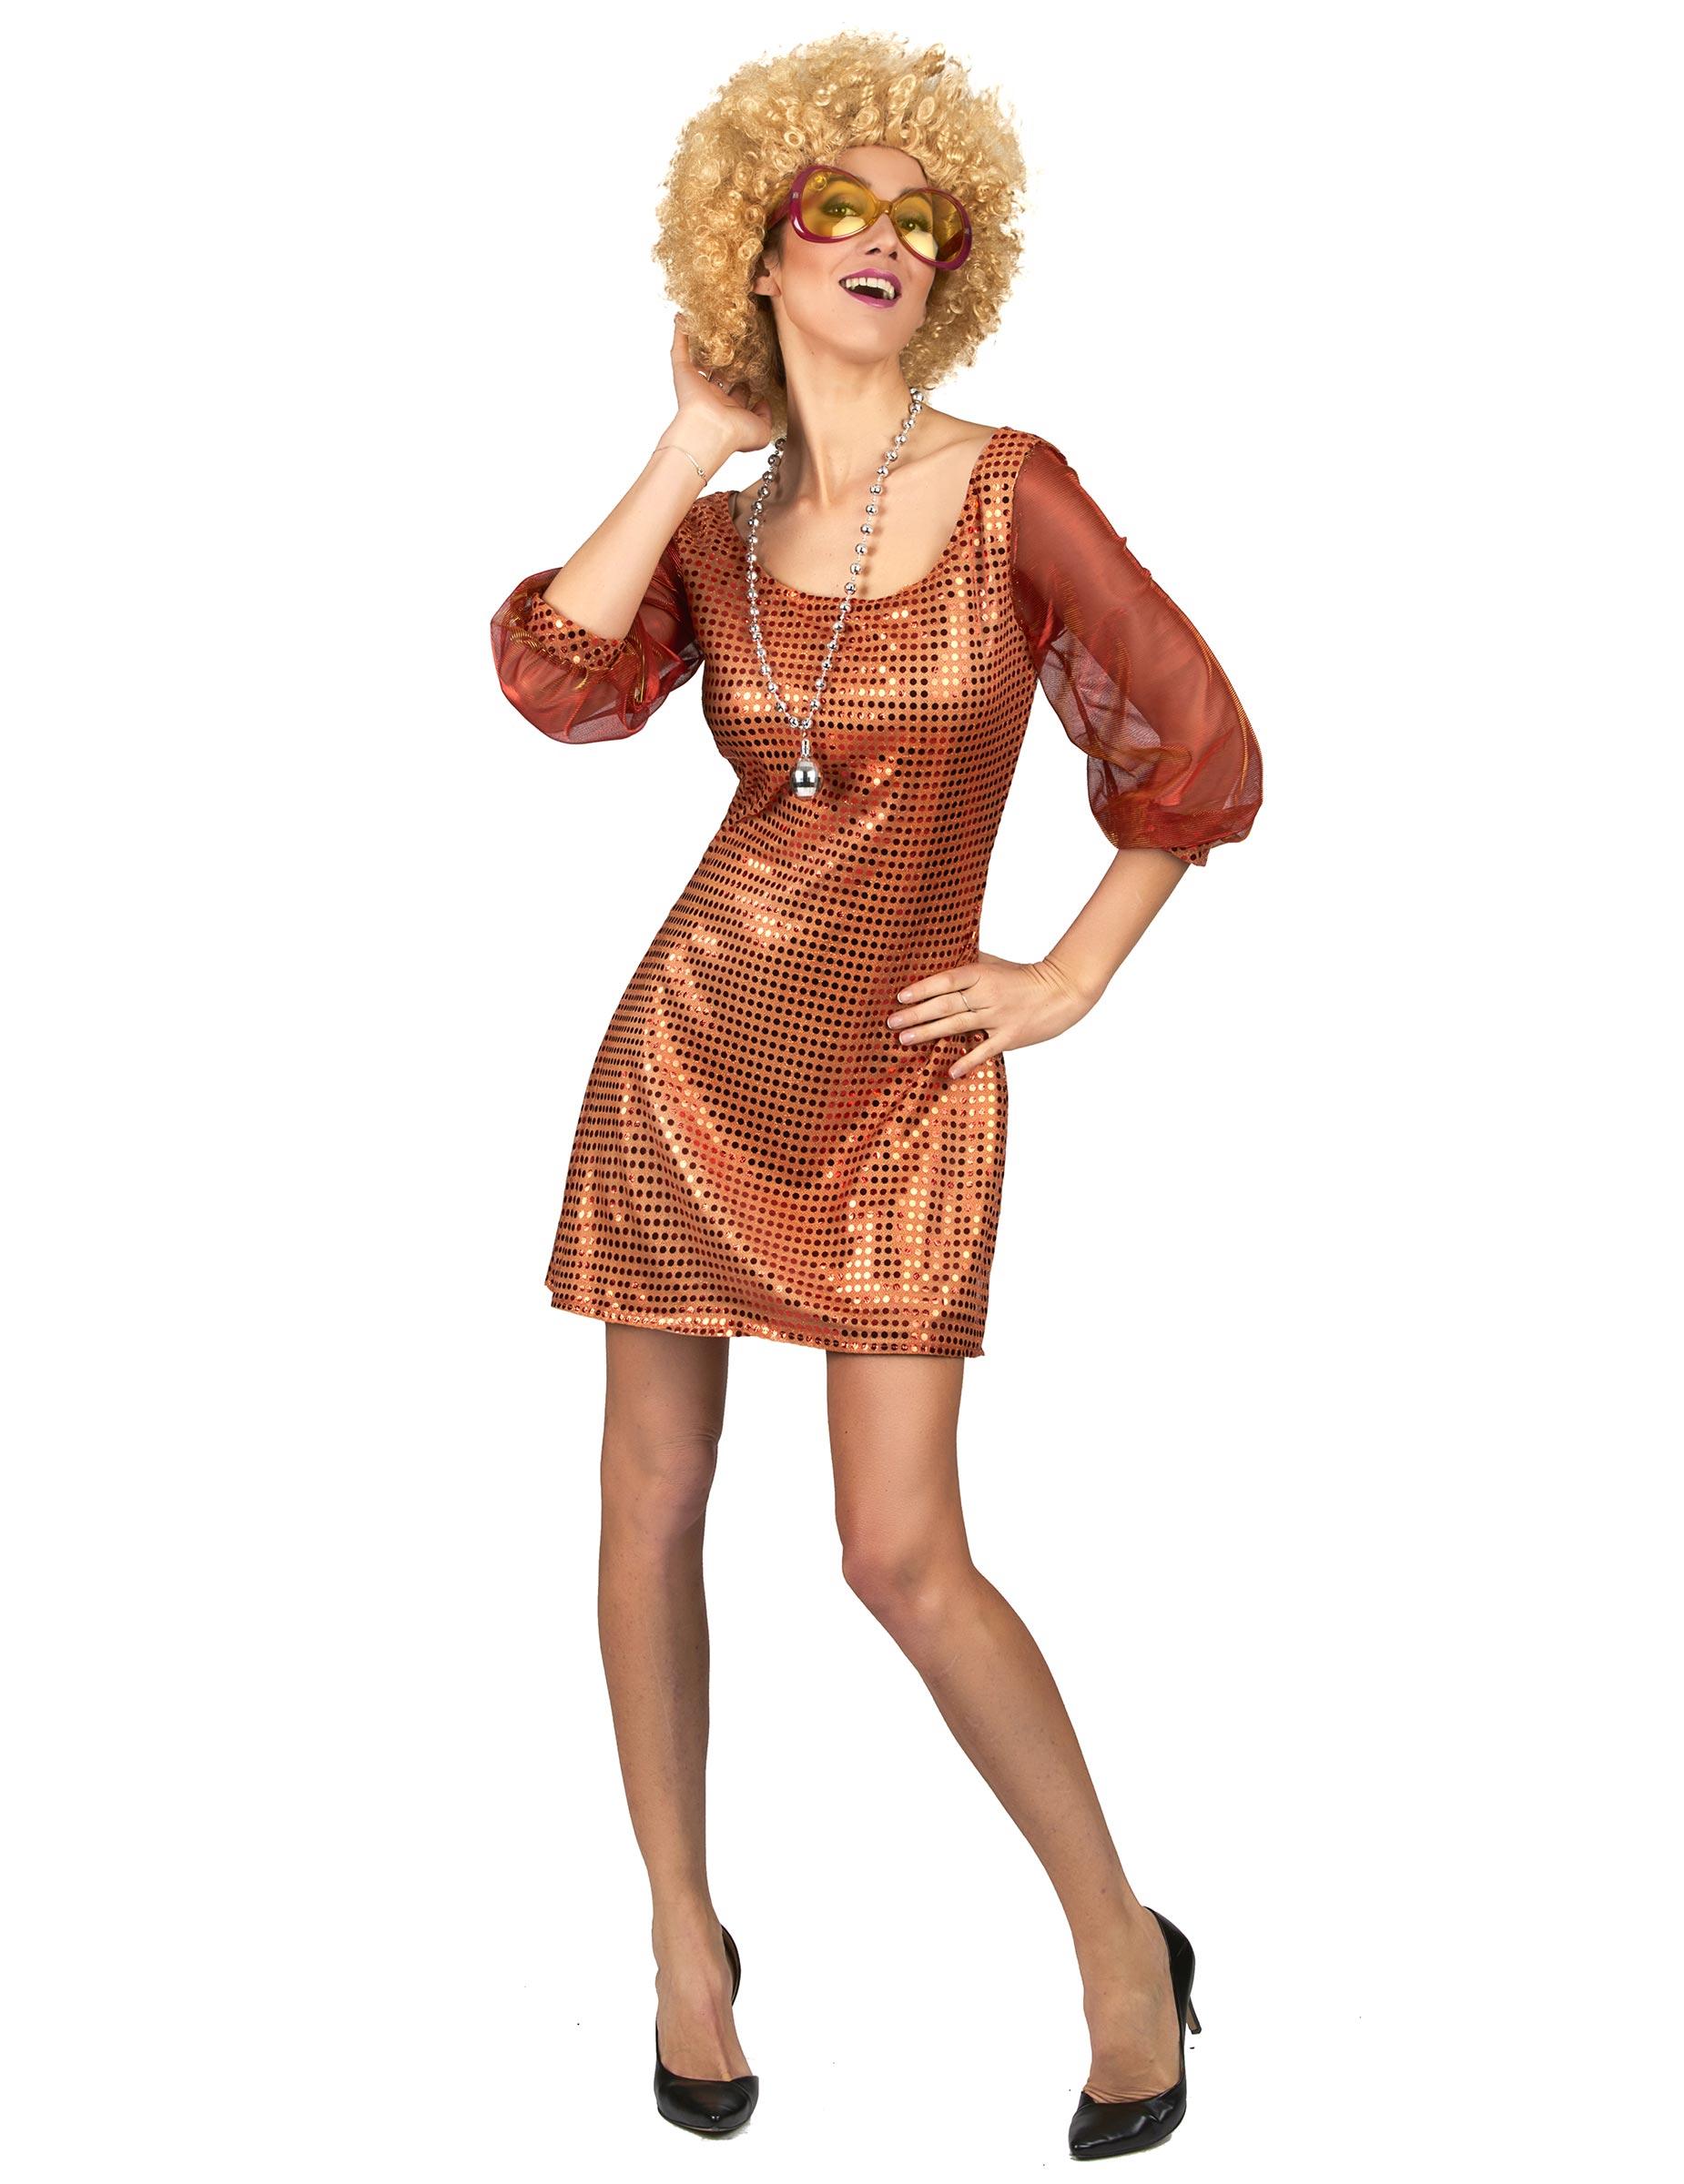 d guisement robe disco orange paillette femme deguise. Black Bedroom Furniture Sets. Home Design Ideas